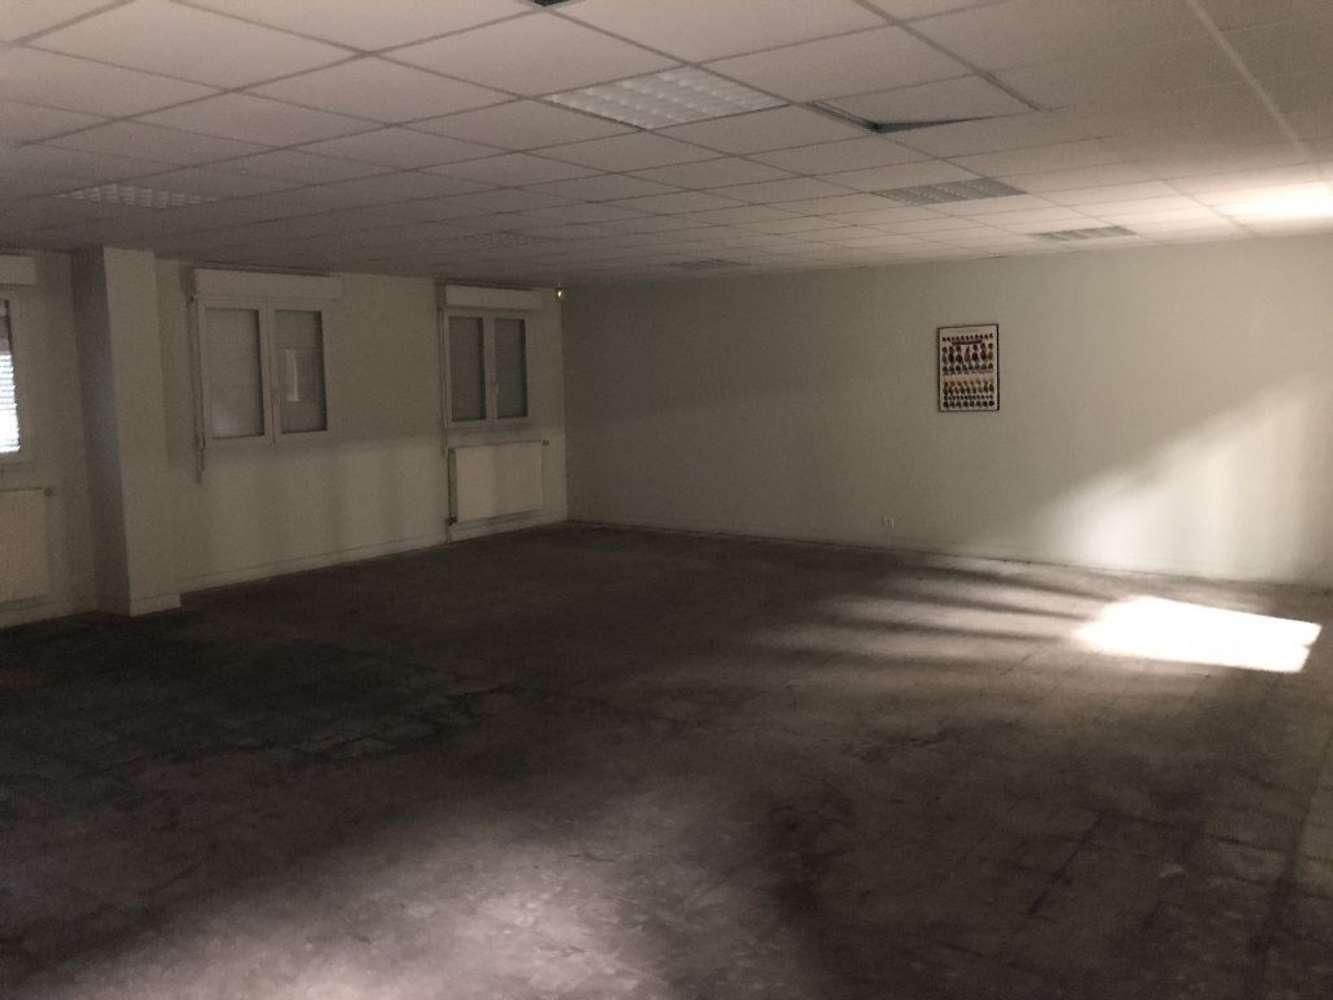 Activités/entrepôt Provins, 77160 - ZAE DE LA GARE - 9617795